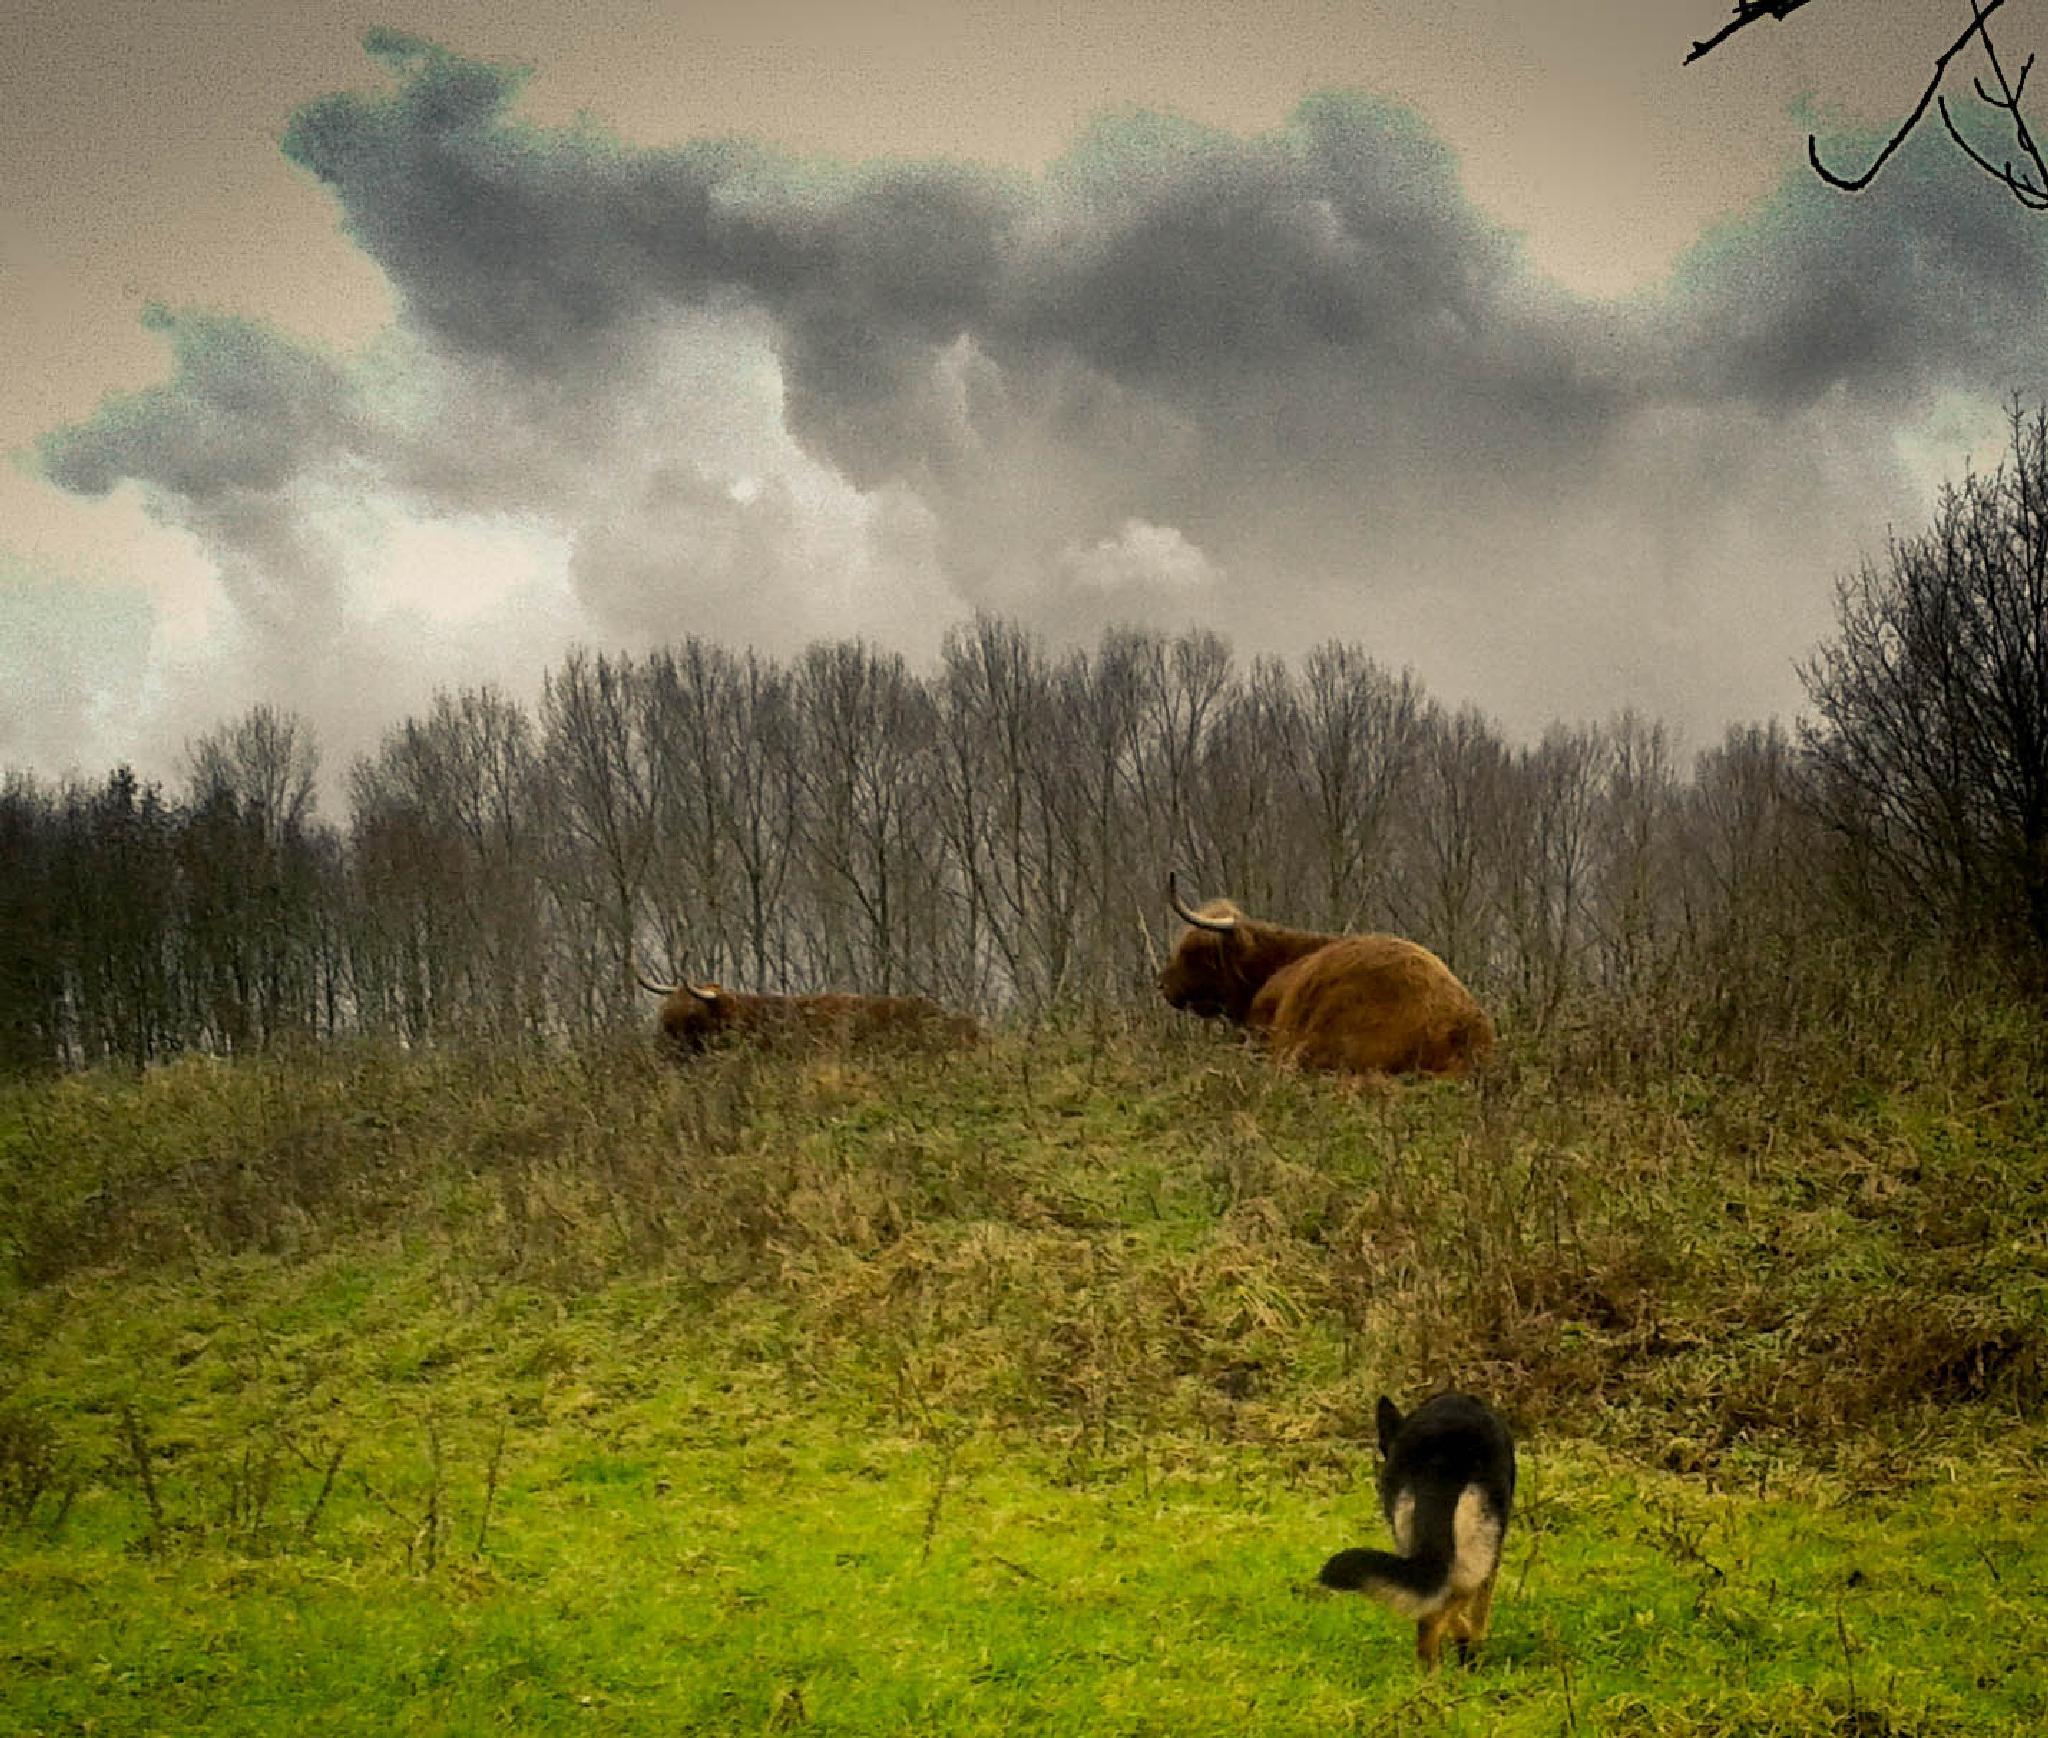 Untitled by Reddogpics